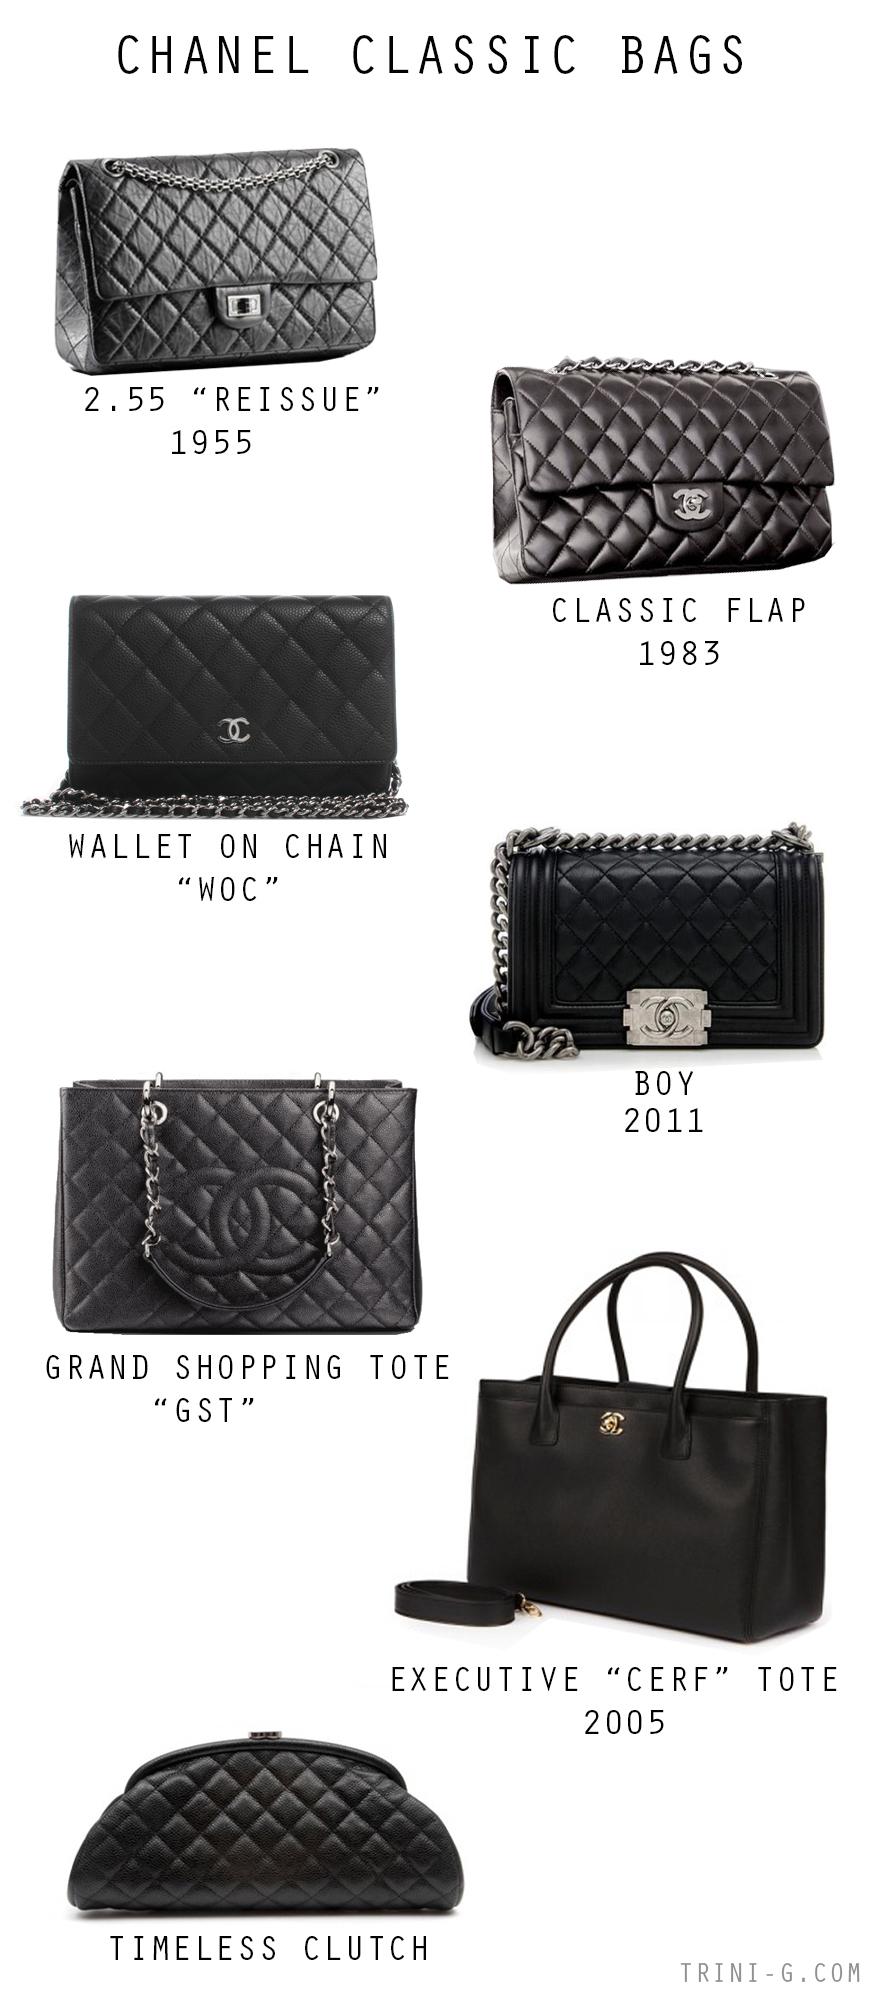 Trini blog| Chanel classic bags